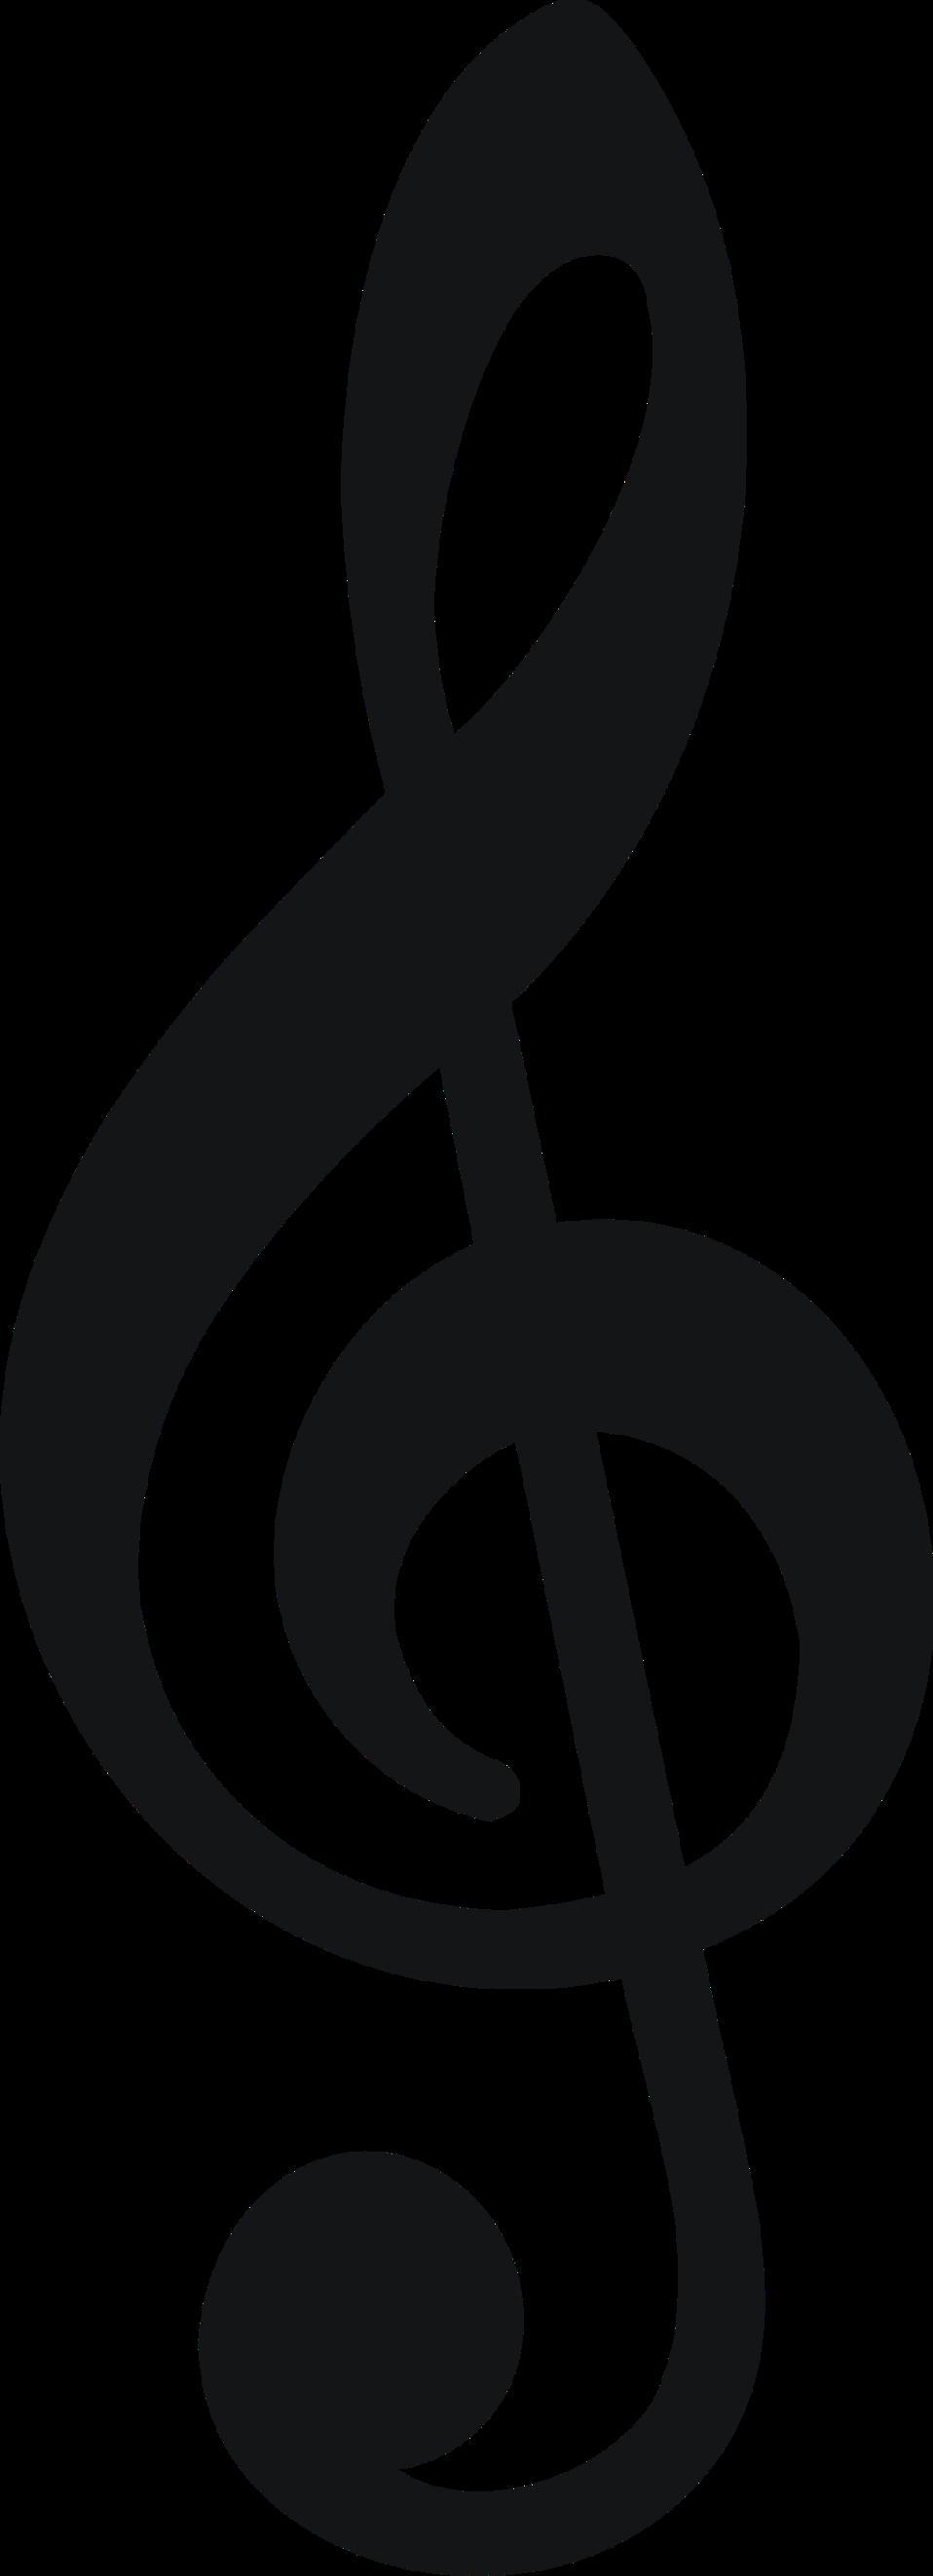 Free Stock Photos Illustration of a treble clef